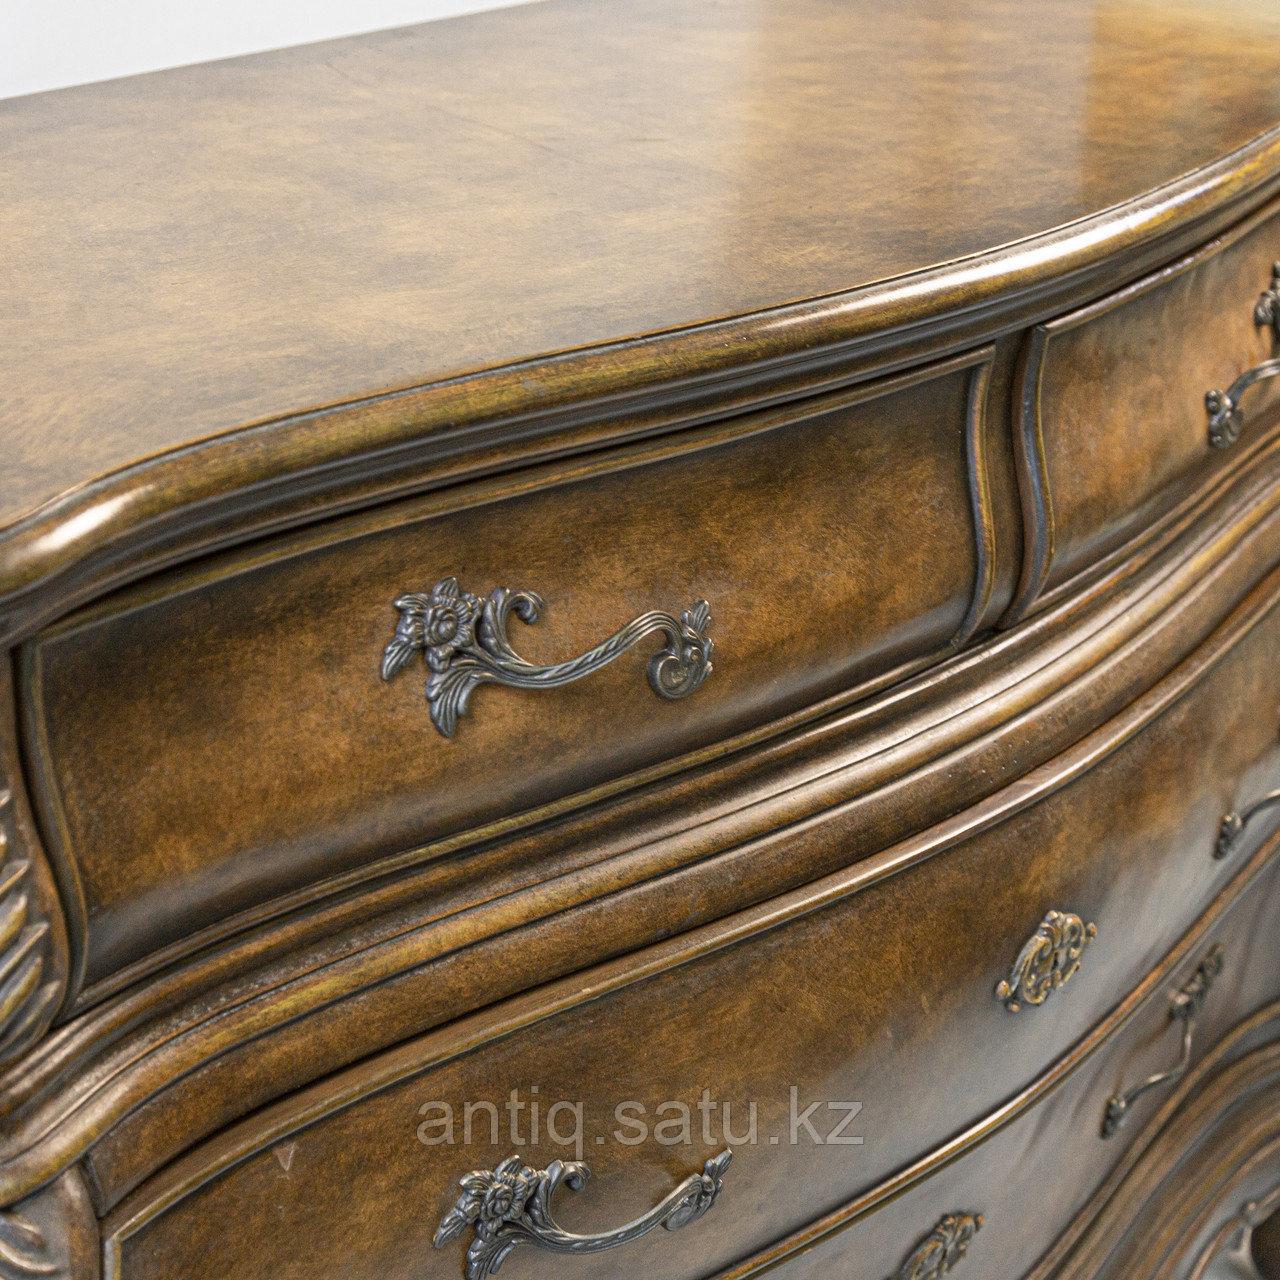 Комод в стиле Людовика XV Привезен из Голландии XX век. - фото 7